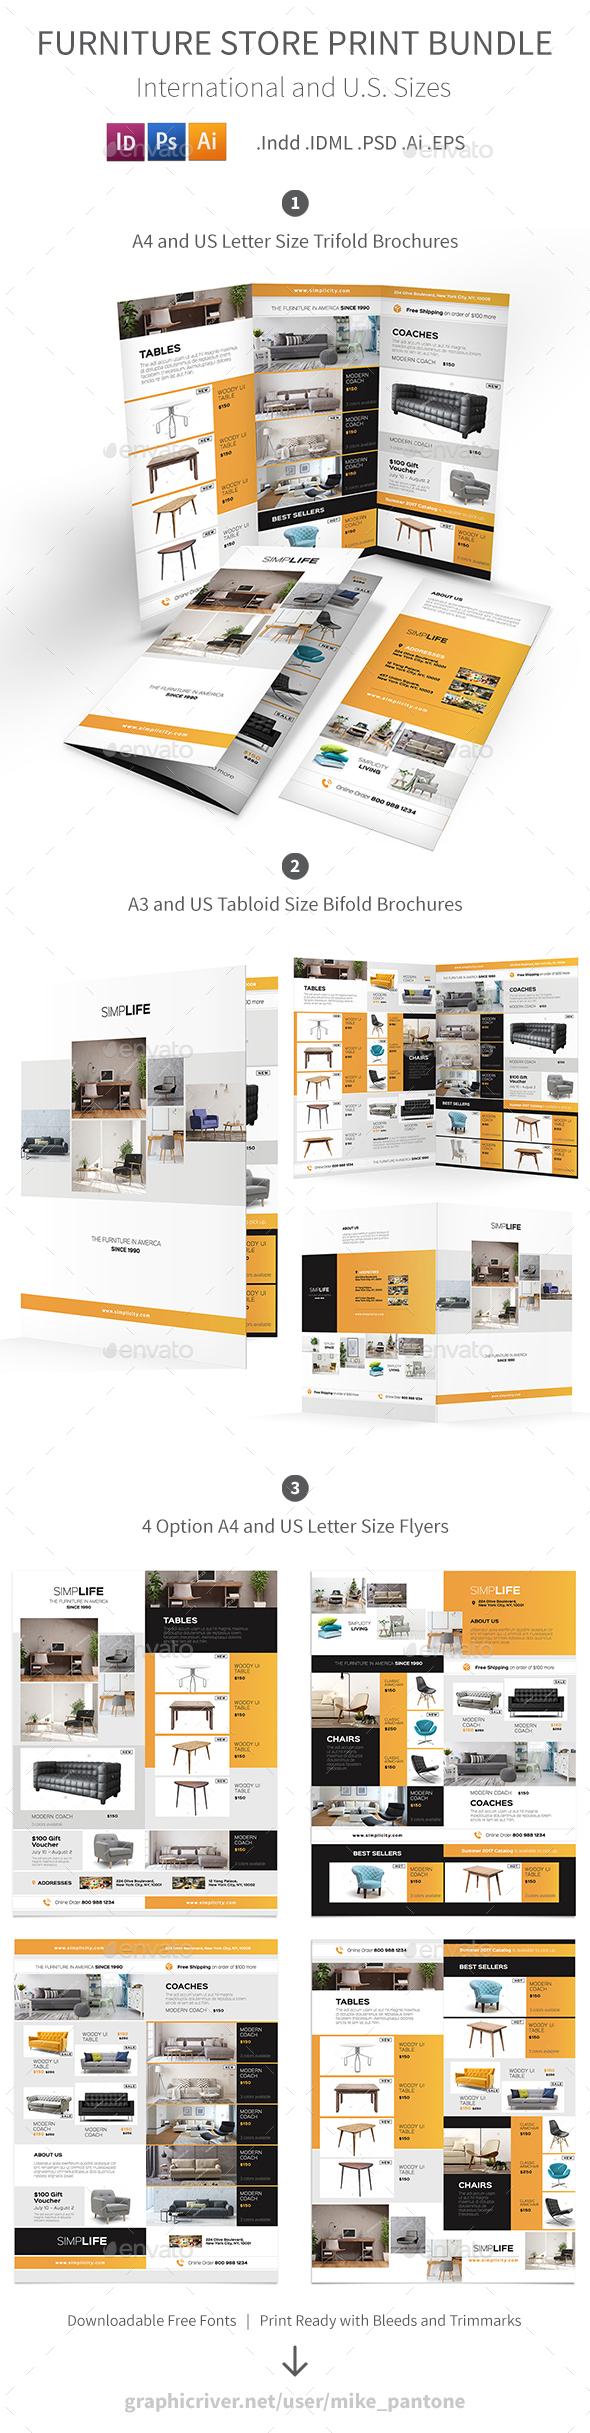 Furniture Store Print Bundle 3 - Informational Brochures